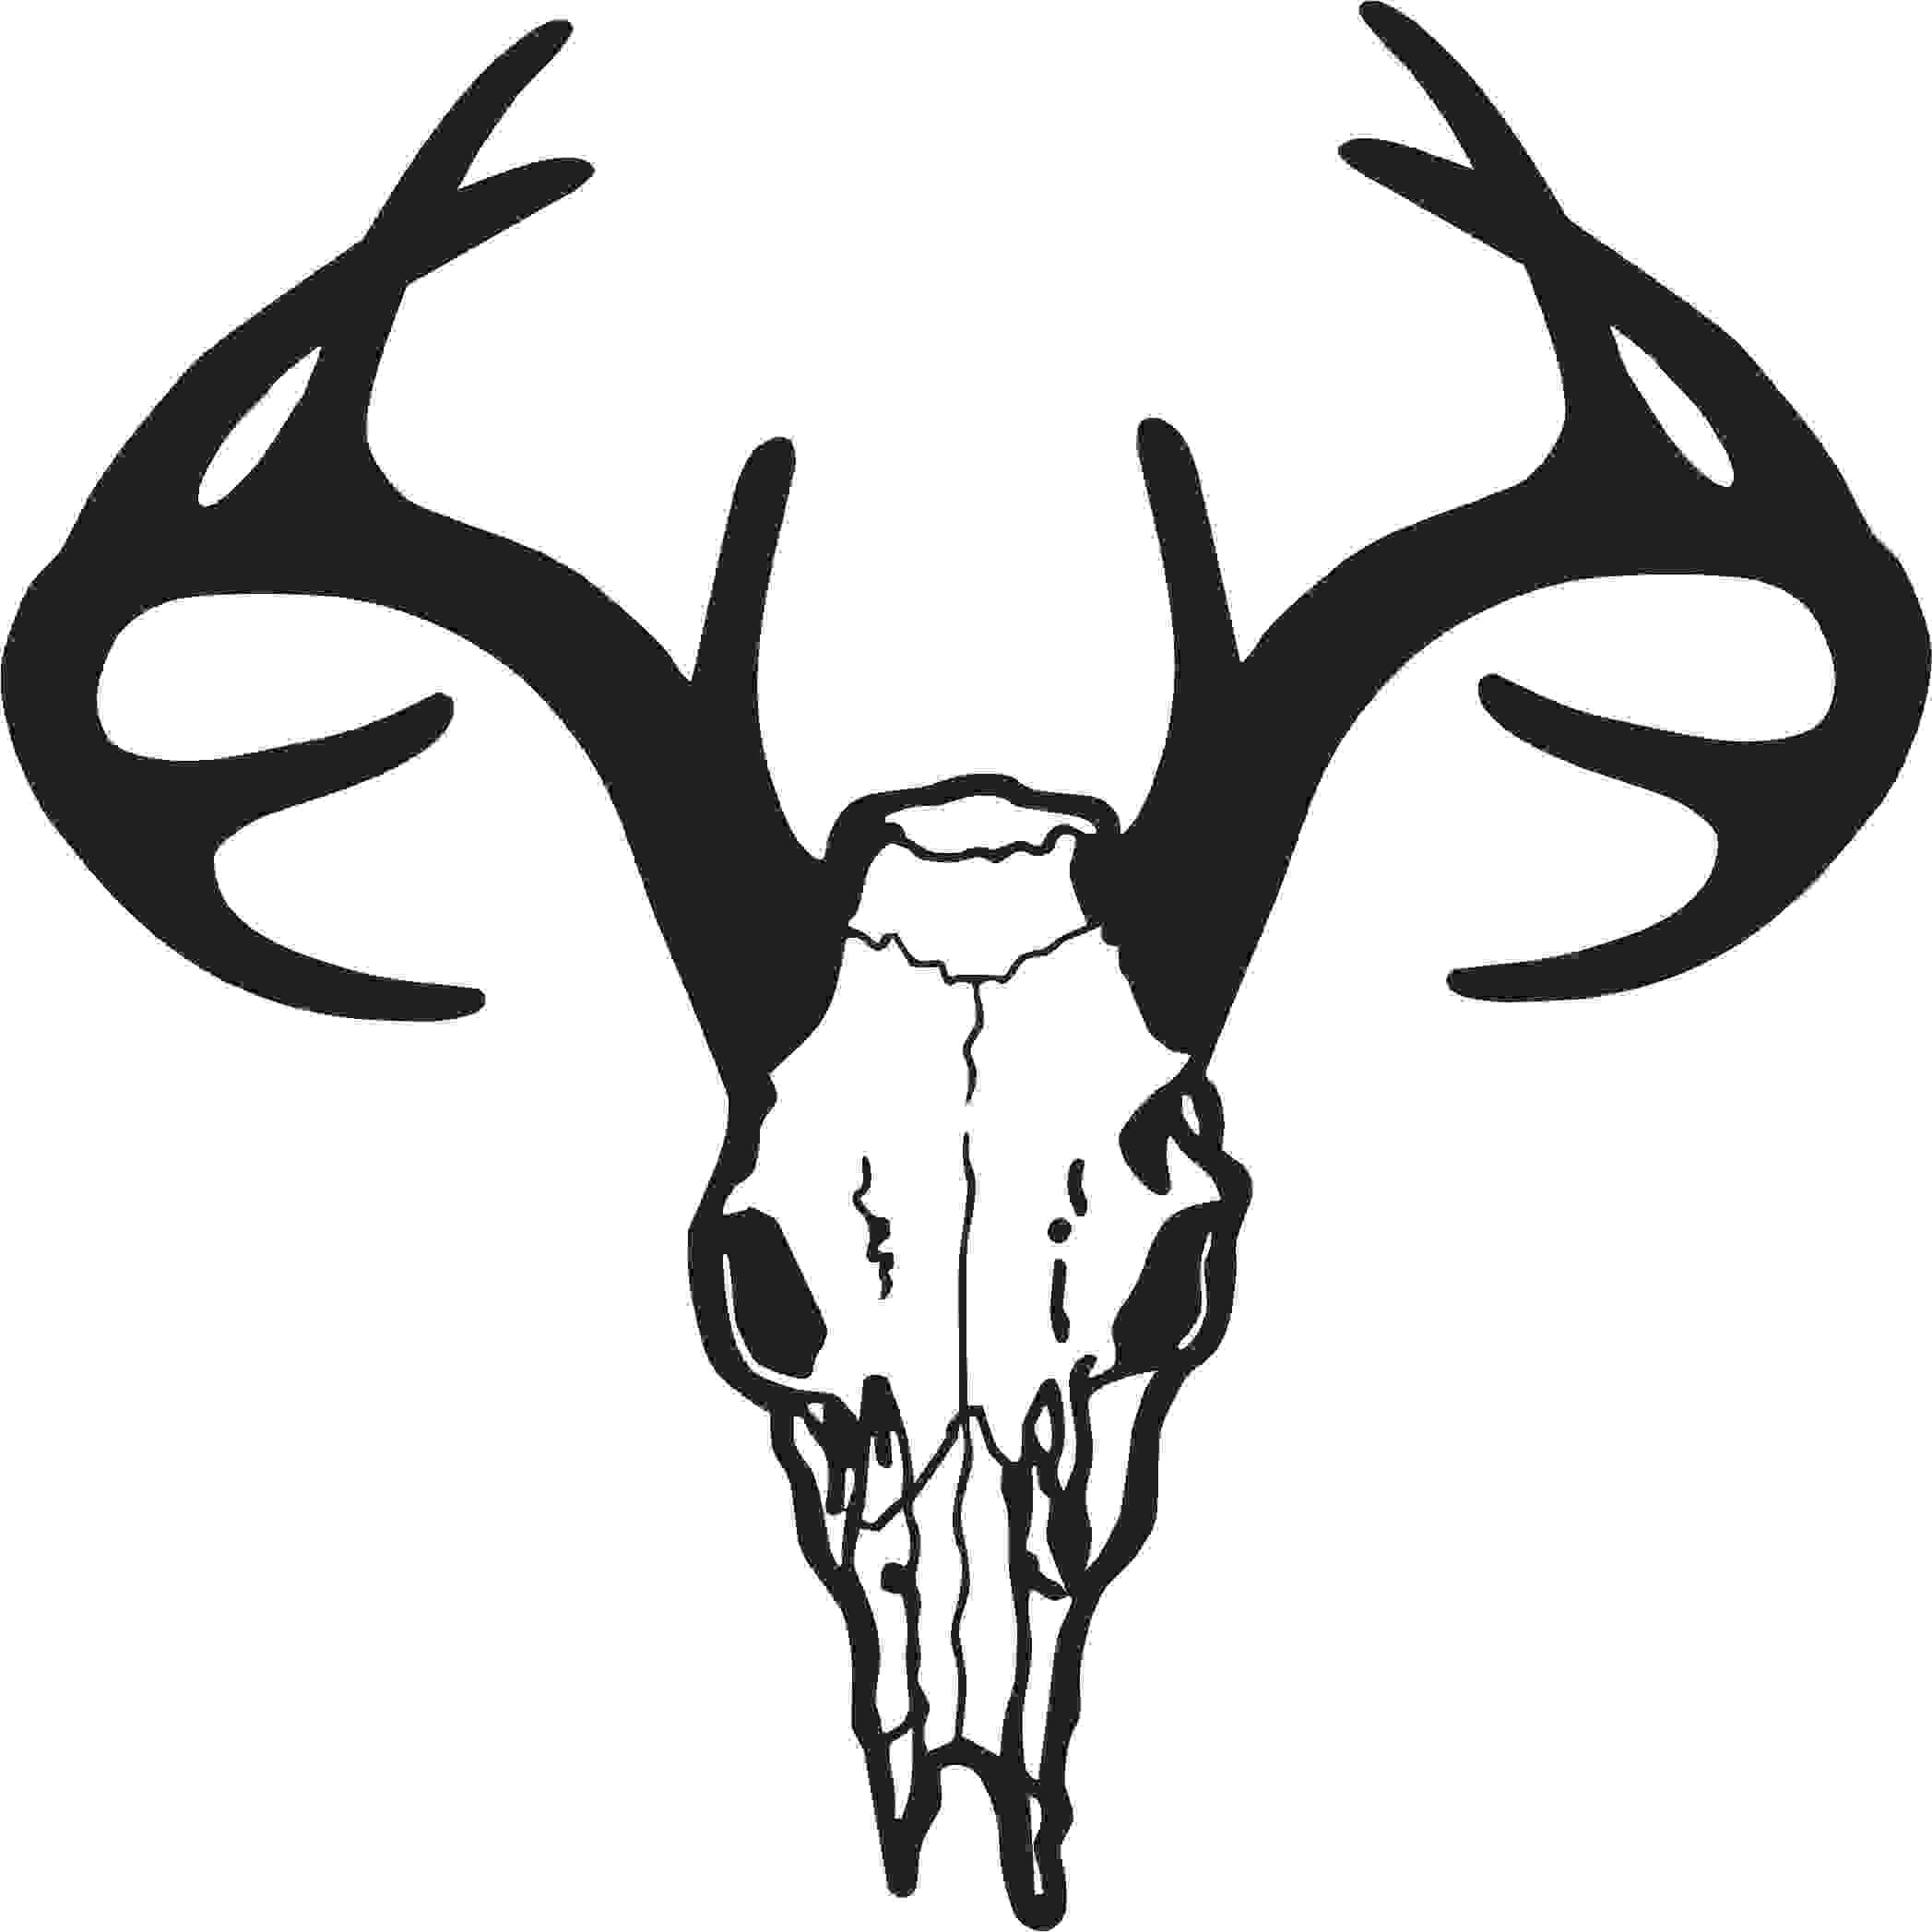 Free Animal Skull Silhouette, Download Free Clip Art, Free.